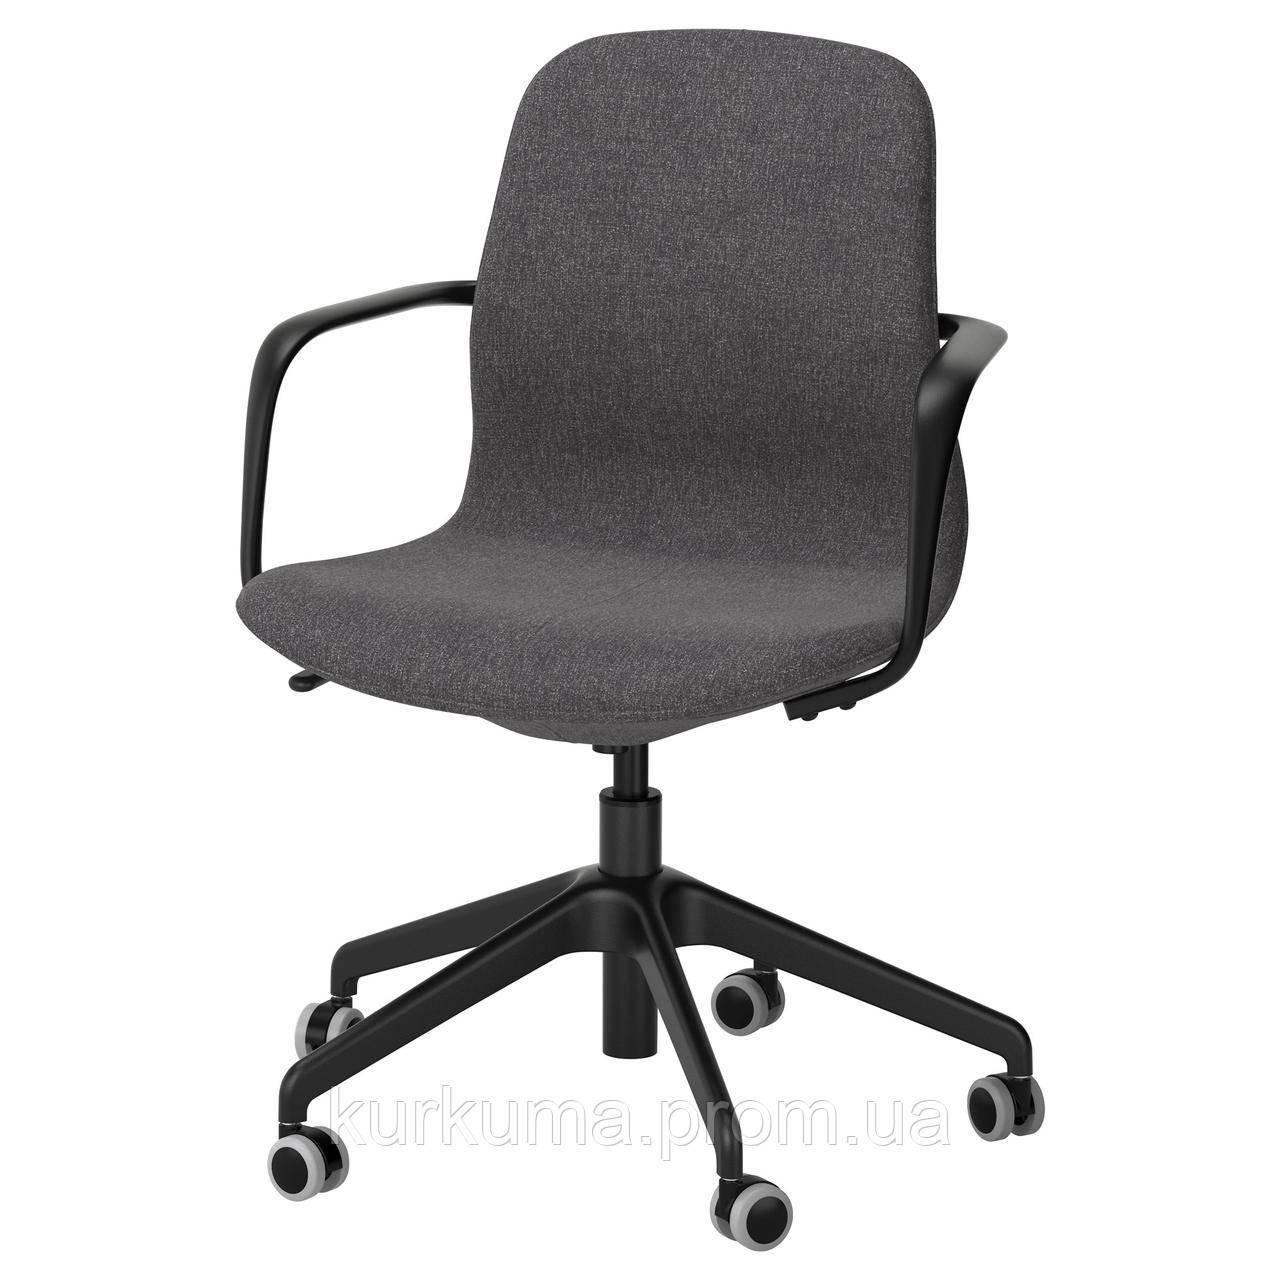 IKEA LANGFJALL Рабочий стул, темно-серый, черный  (591.779.02)